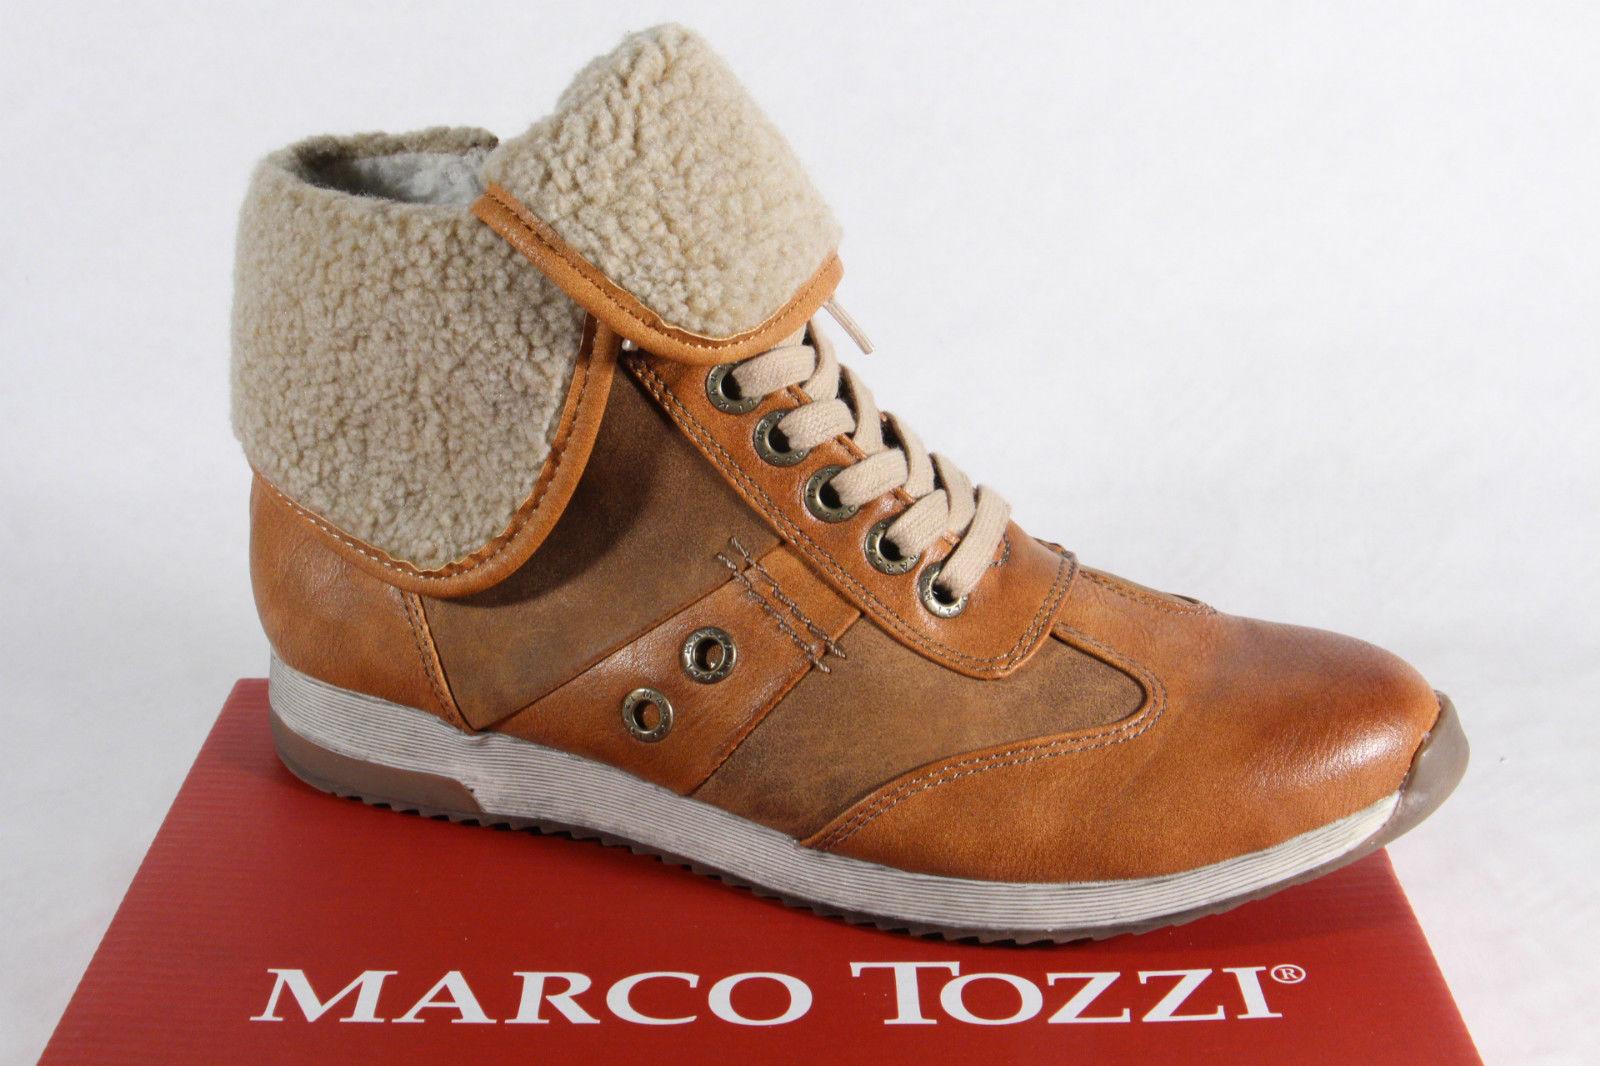 Marco Tozzi Stiefel Stiefeletten Boots Kunstleder beige Reißverschluss NEU!